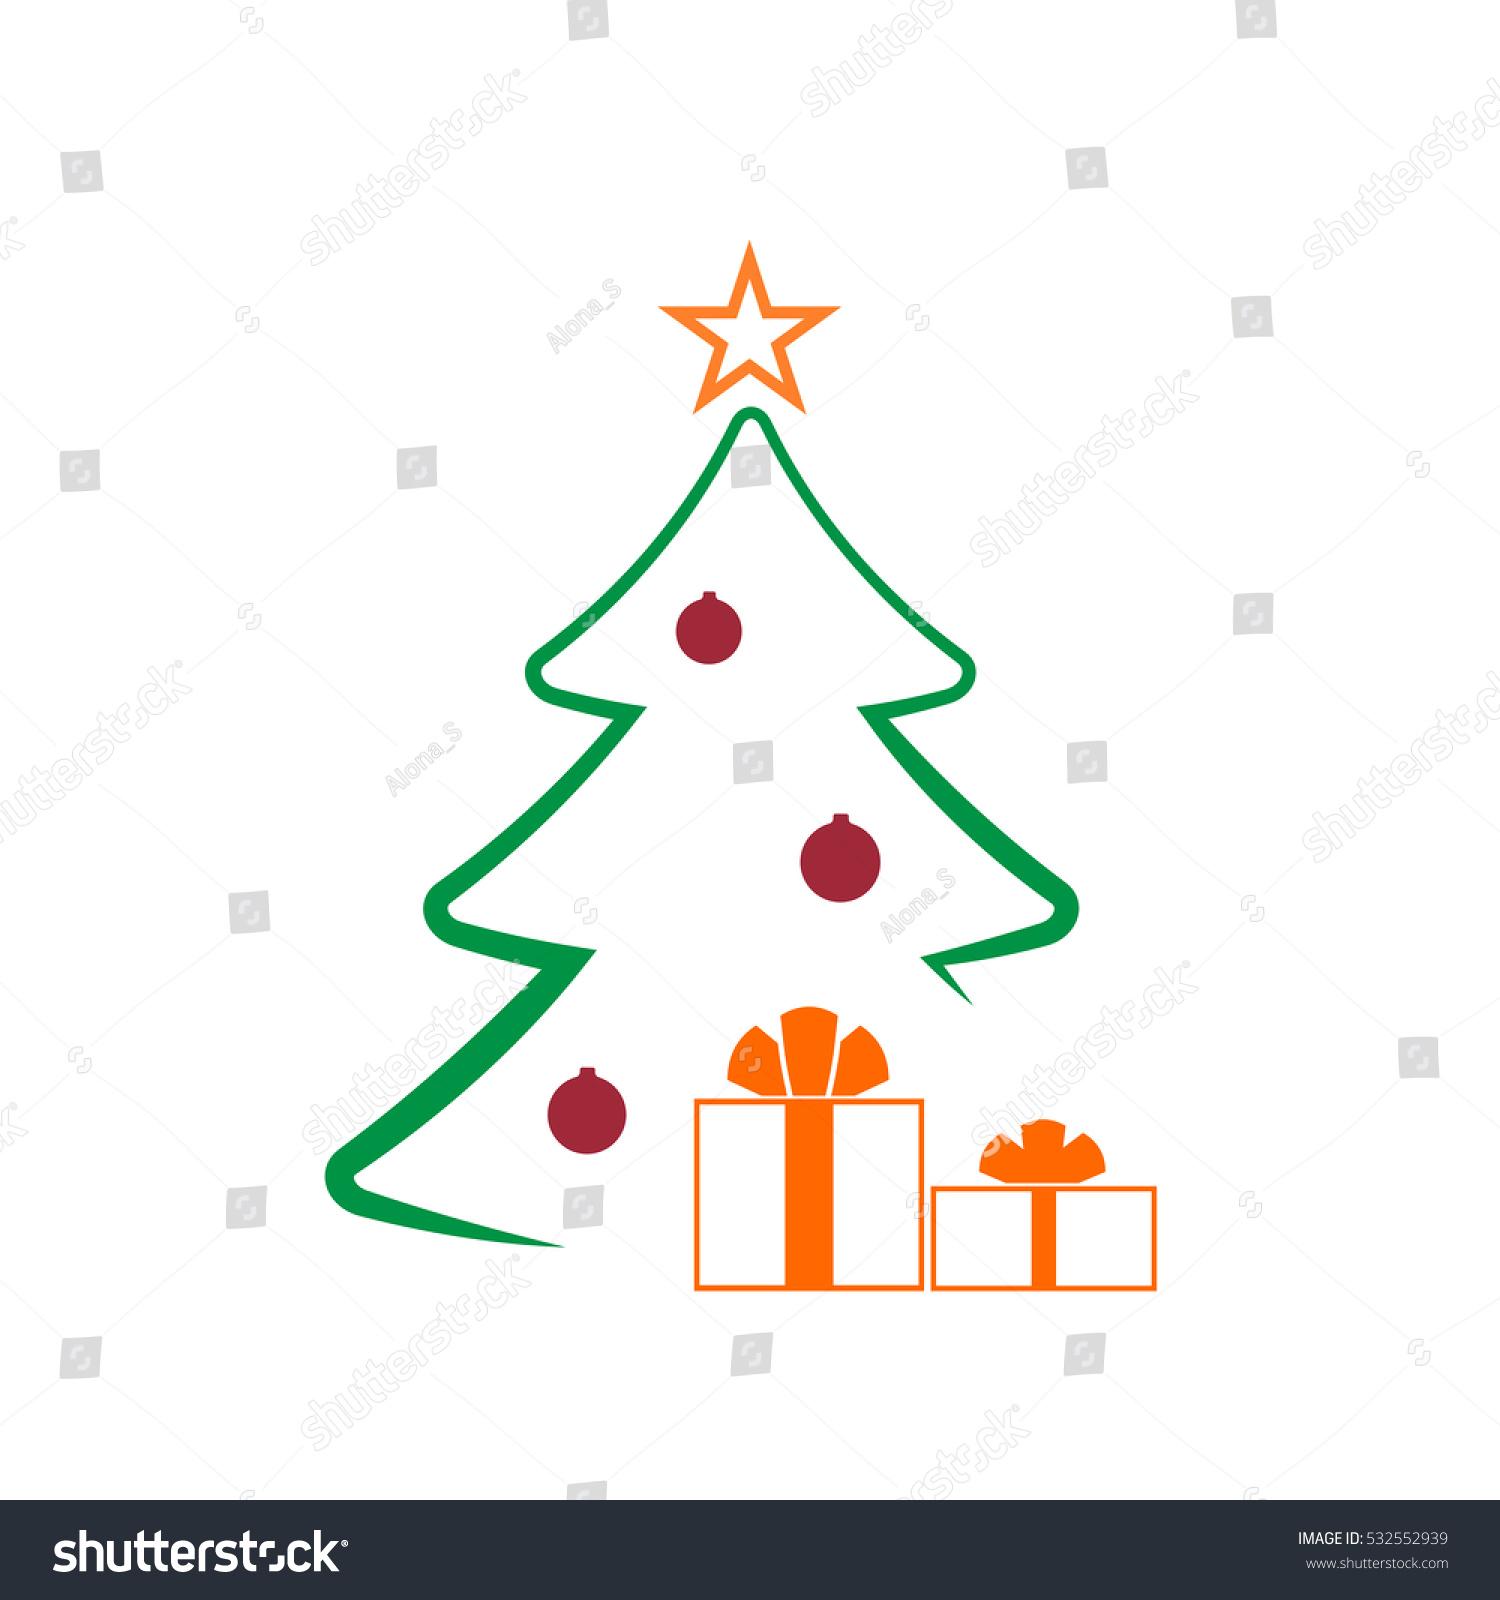 Christmas tree balls star gift cartoon stock illustration